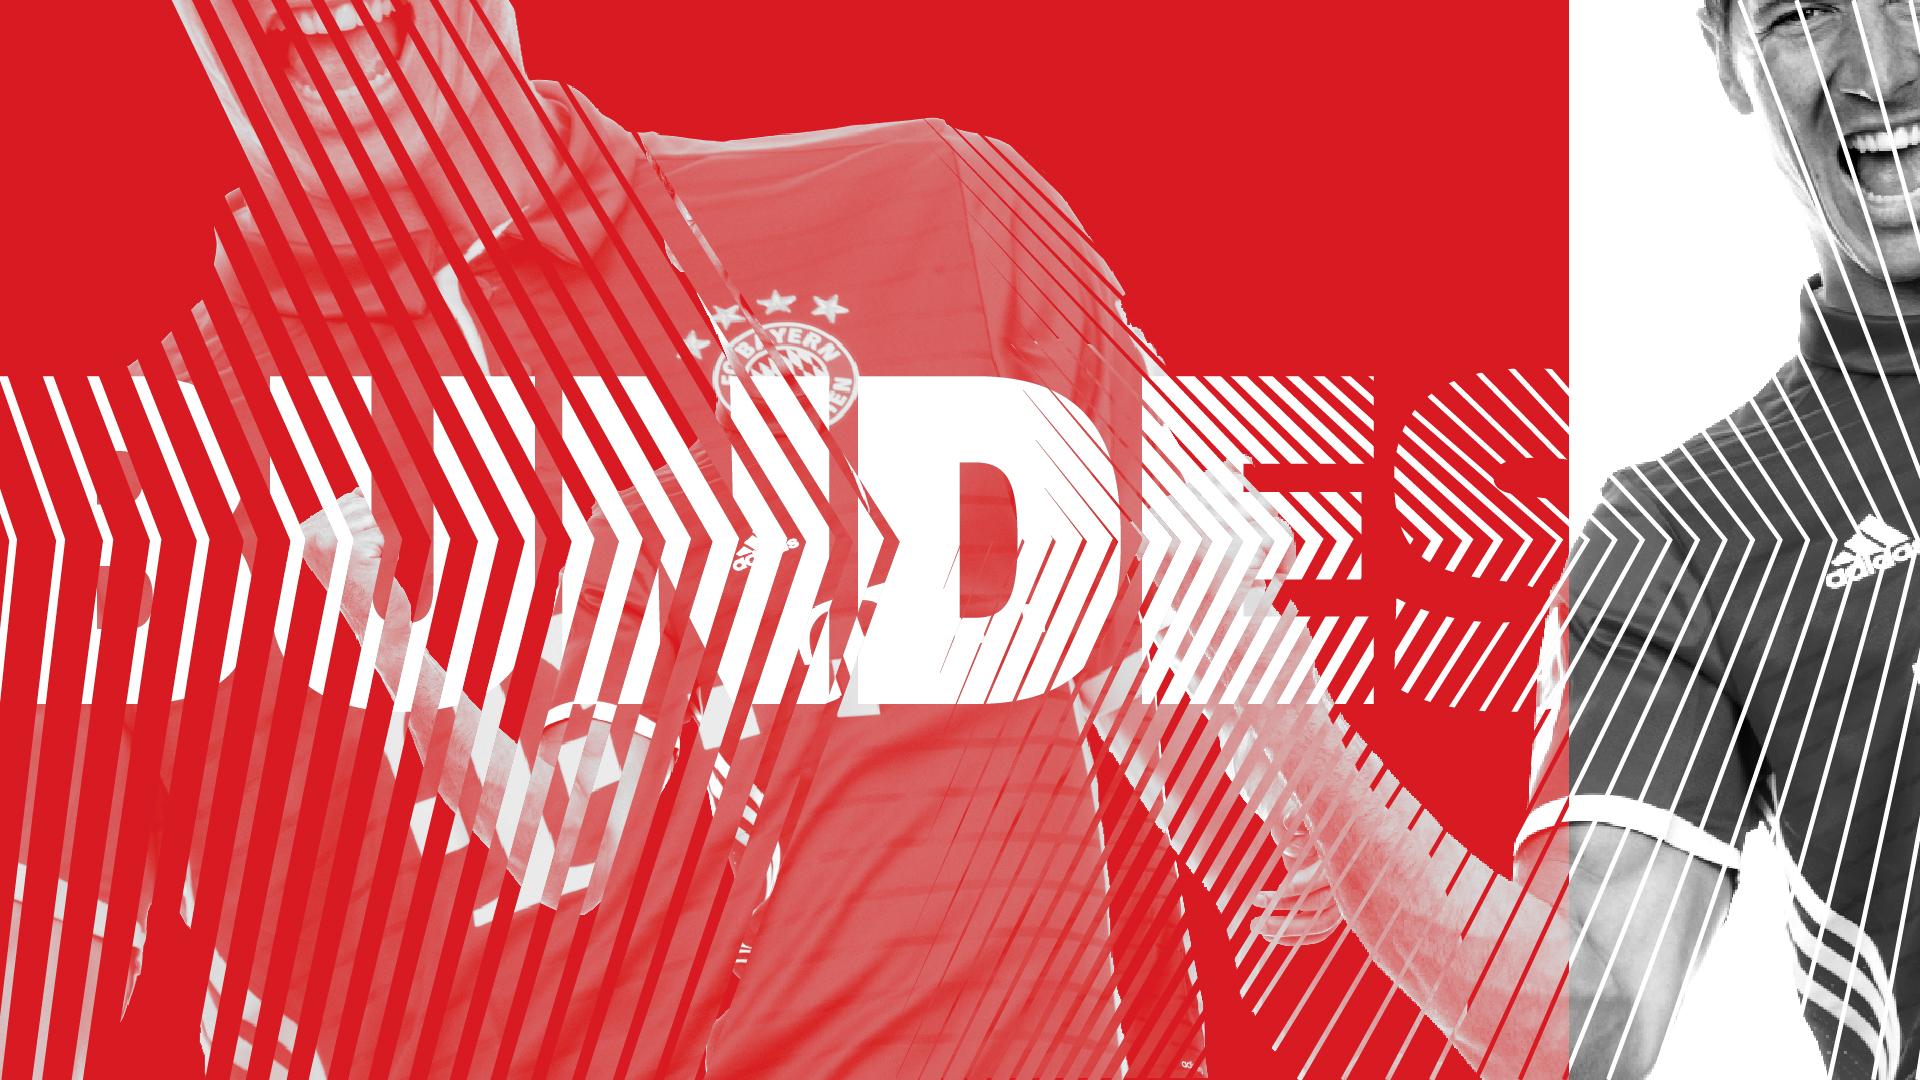 Bundesliga_Branding_08112016_ajustes-15